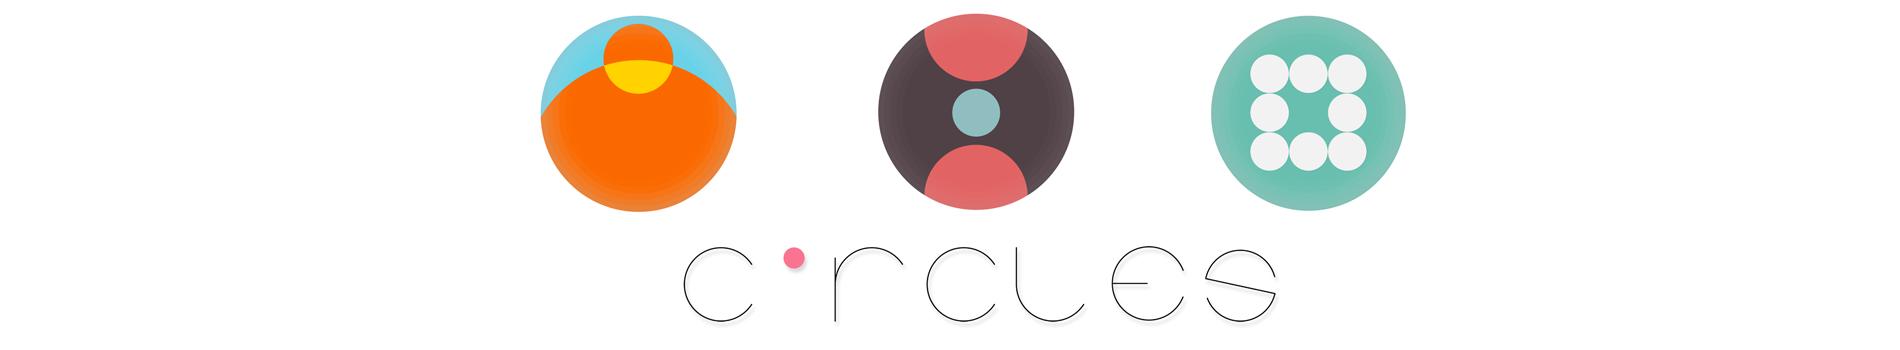 Circles-banner